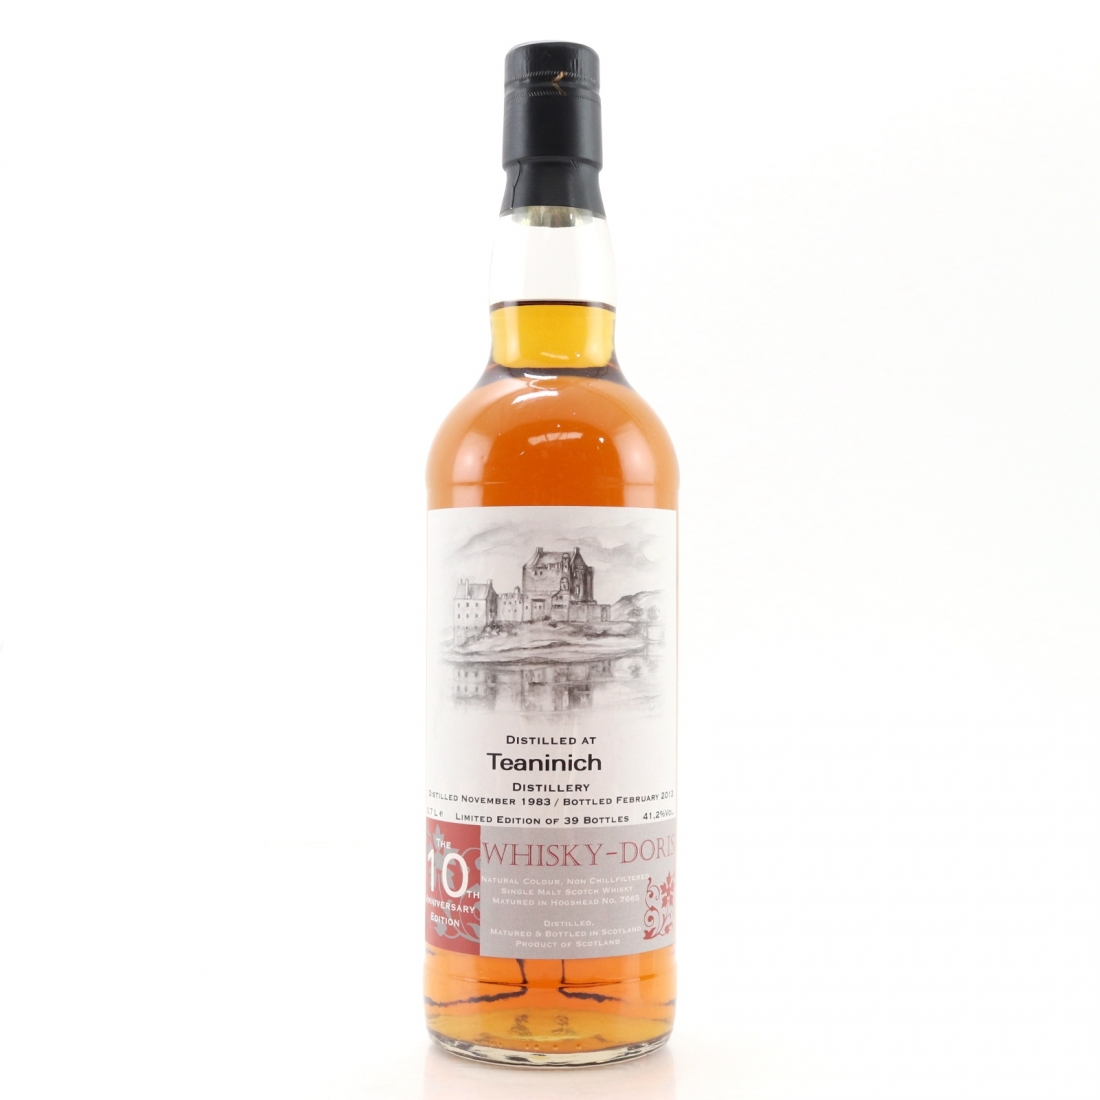 Teaninich 1983 Whisky-Doris